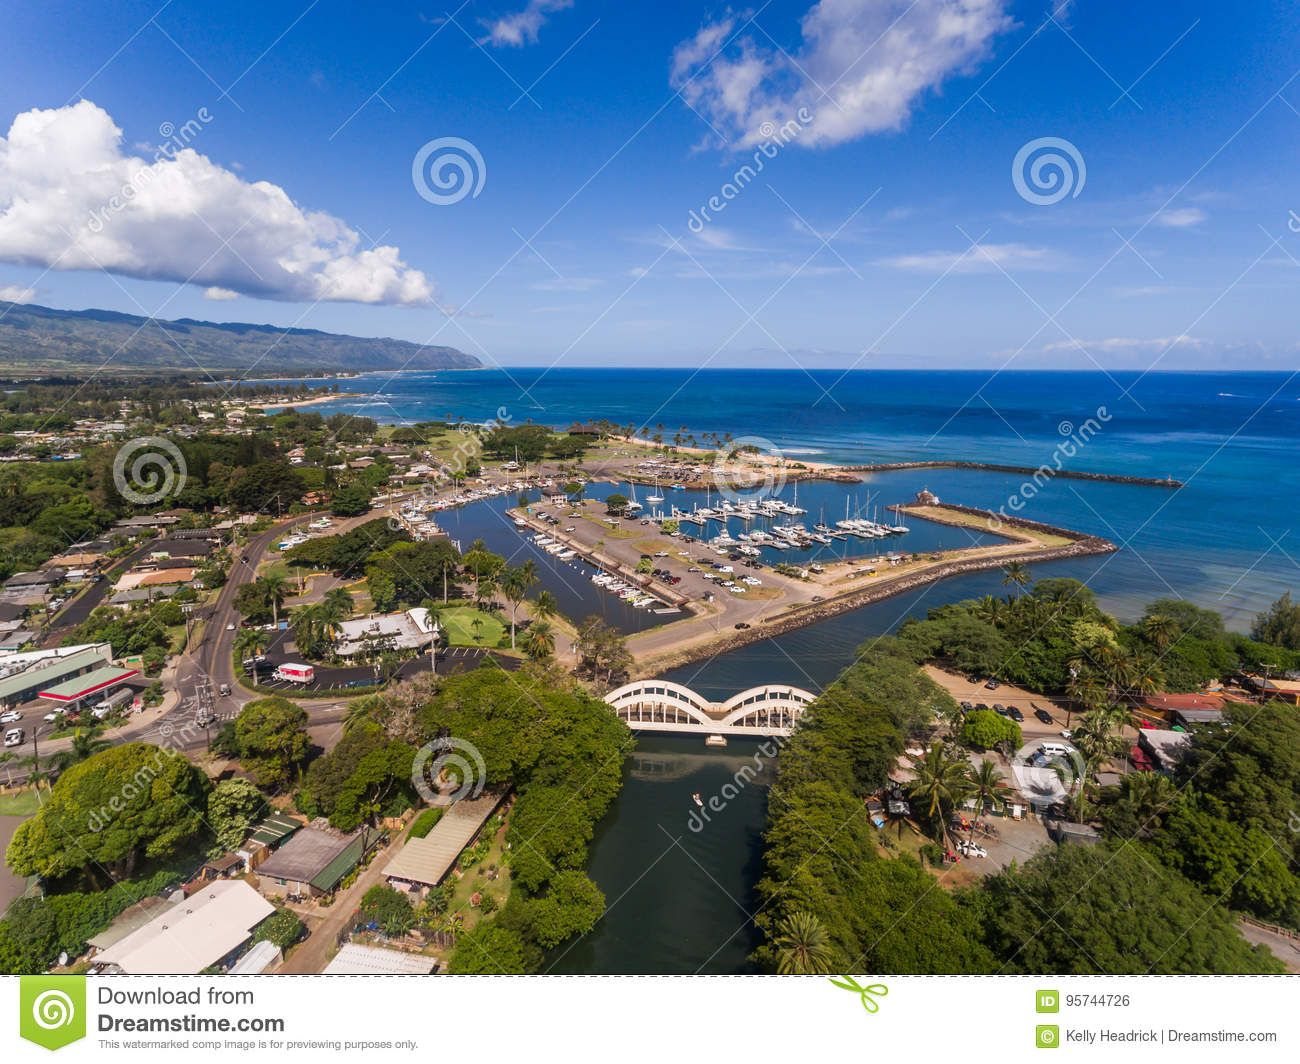 Name:  aerial-view-haleiwa-town-harbor-small-boat-anahulu-river-bridge-95744726.jpg Views: 869 Size:  241.9 KB